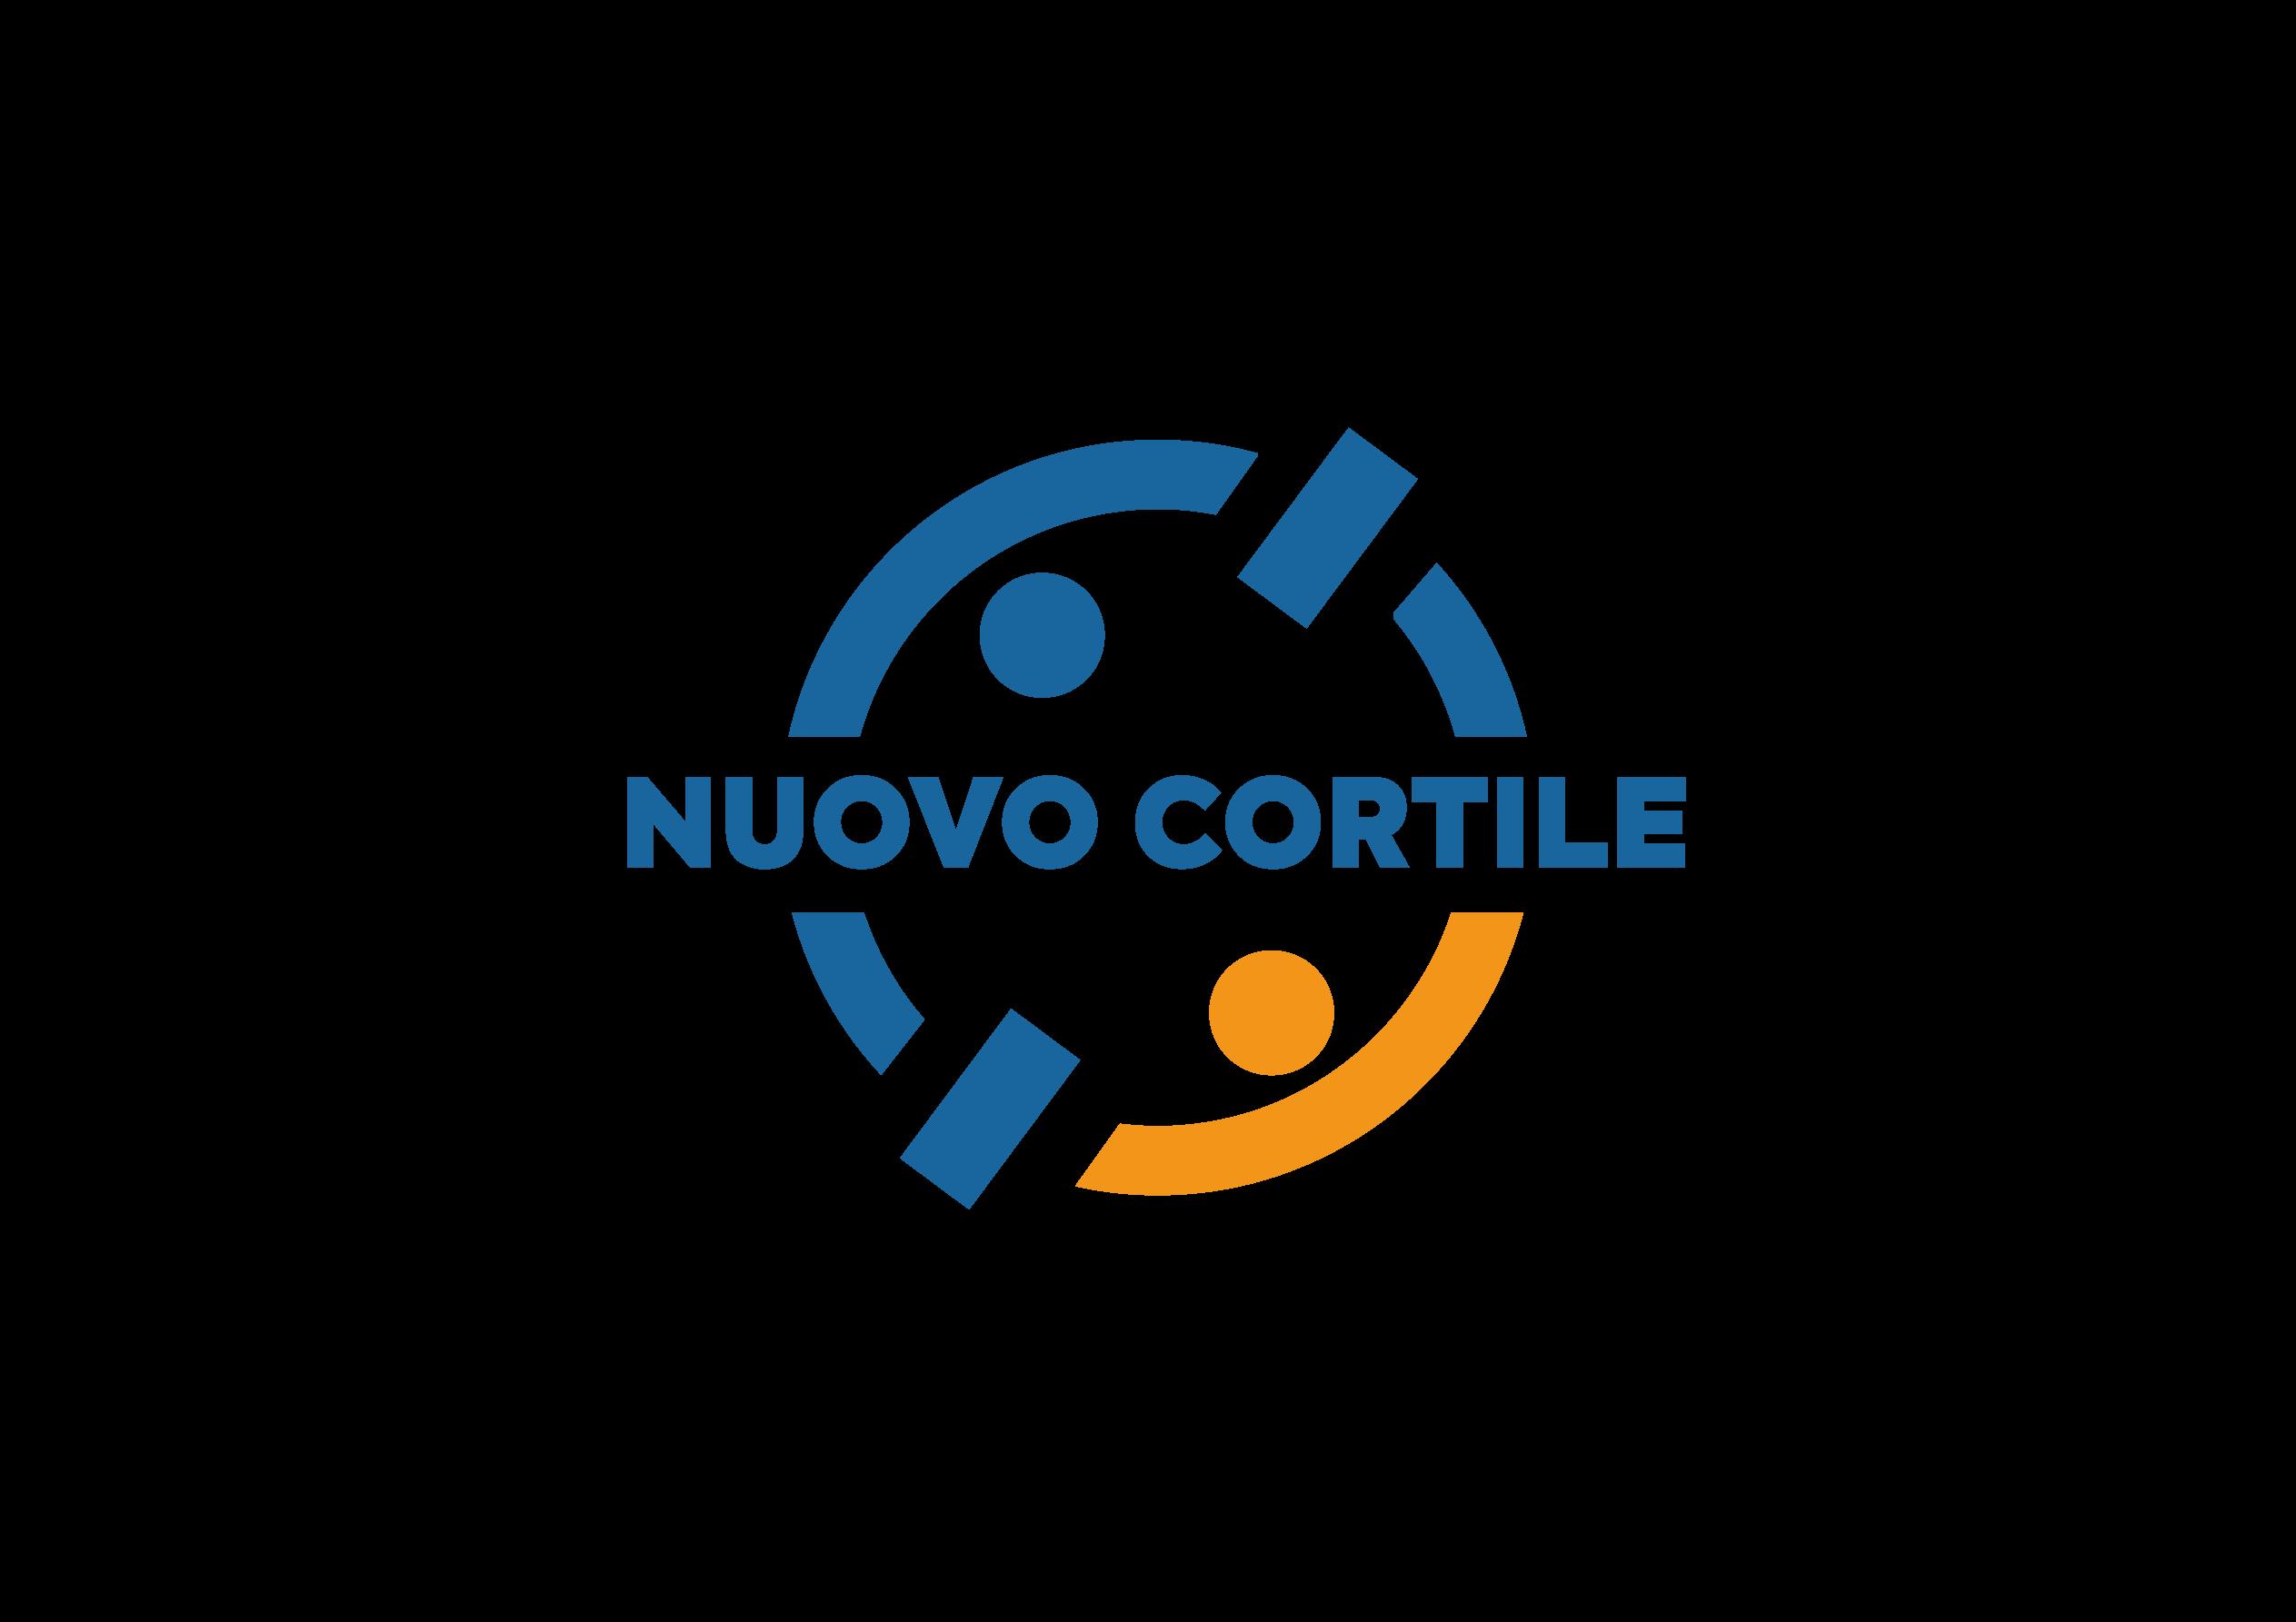 Logo_Nuovo_cortile_No_Pay_off